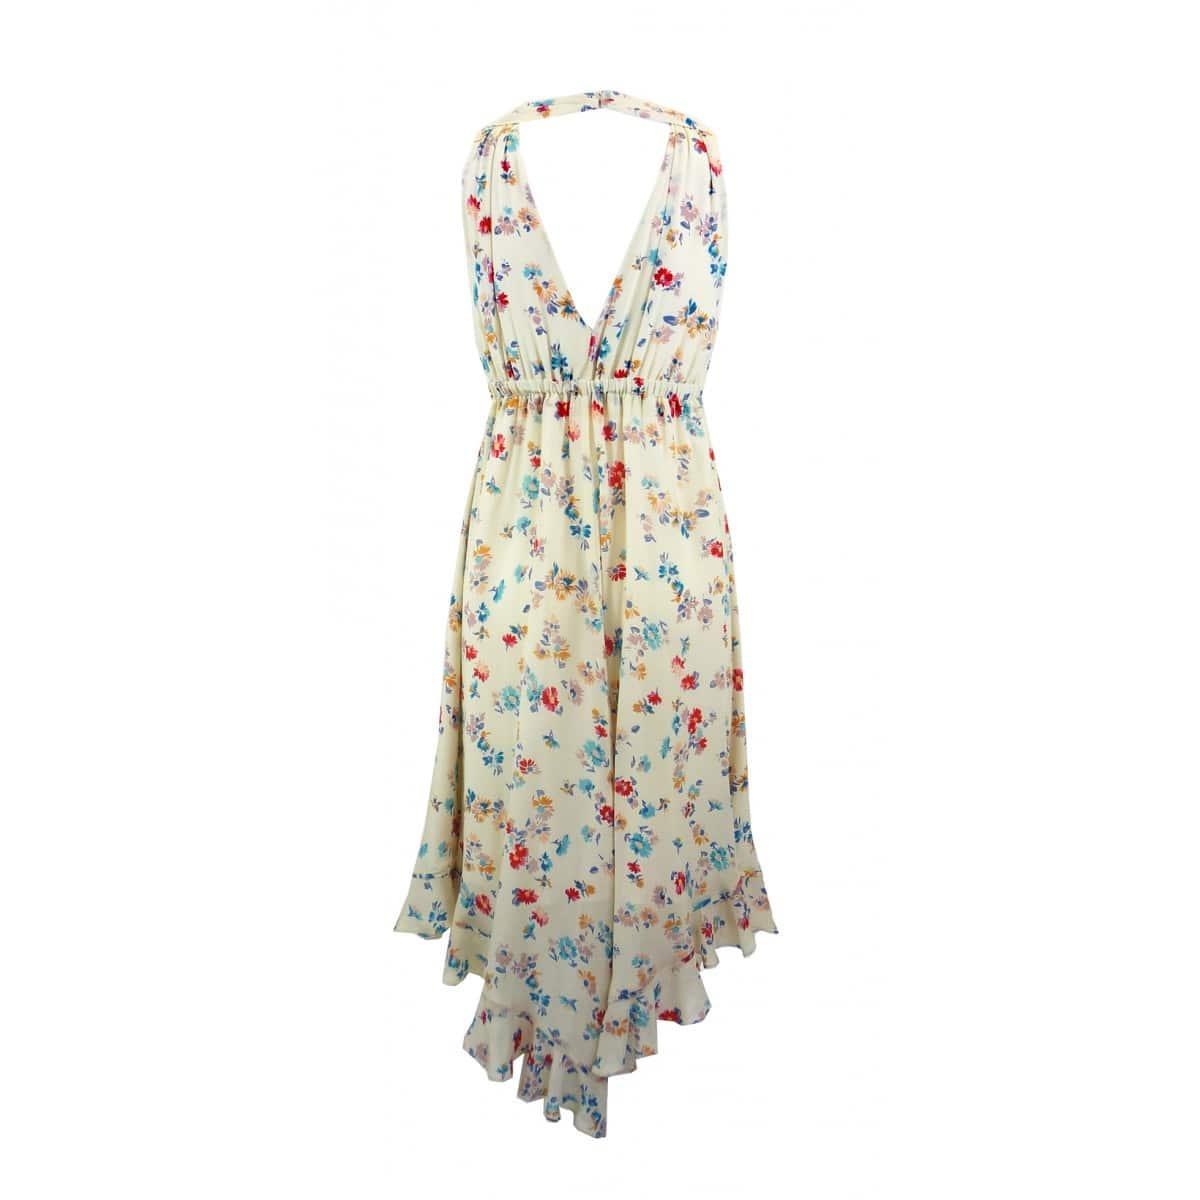 leenoy-broadway-silk-floral-print-dress